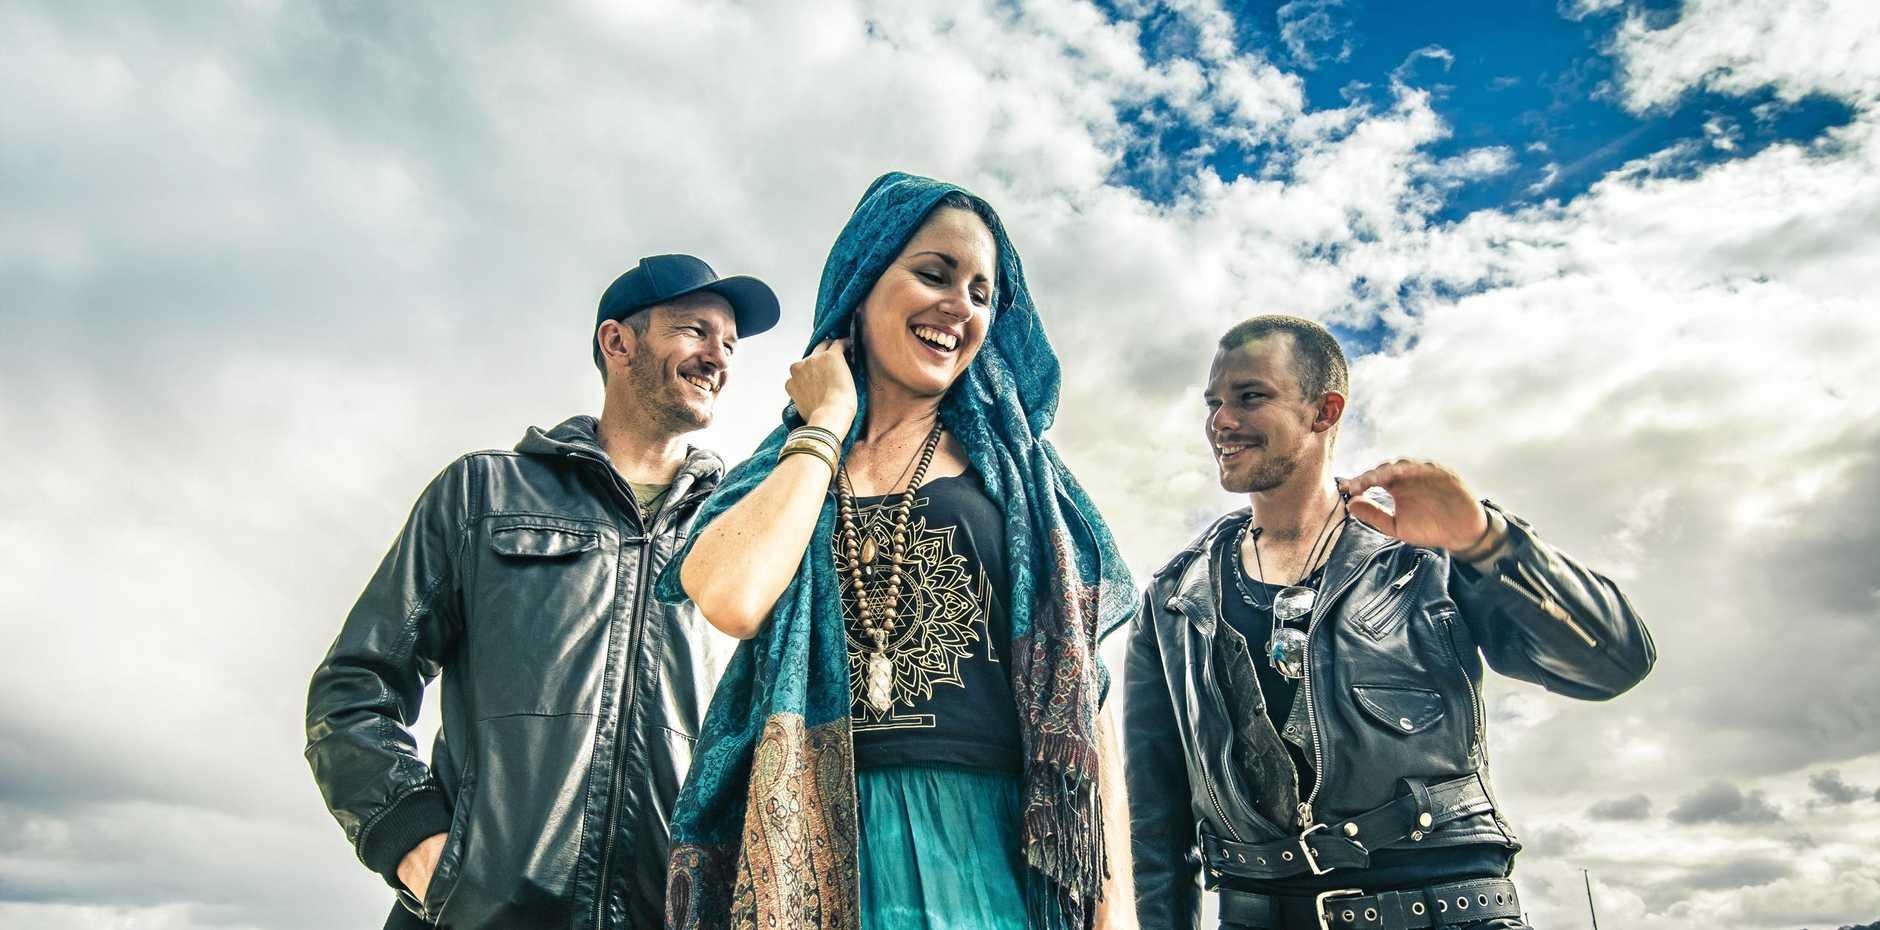 NEW ALBUM: Dubarray is performing in Yandina.